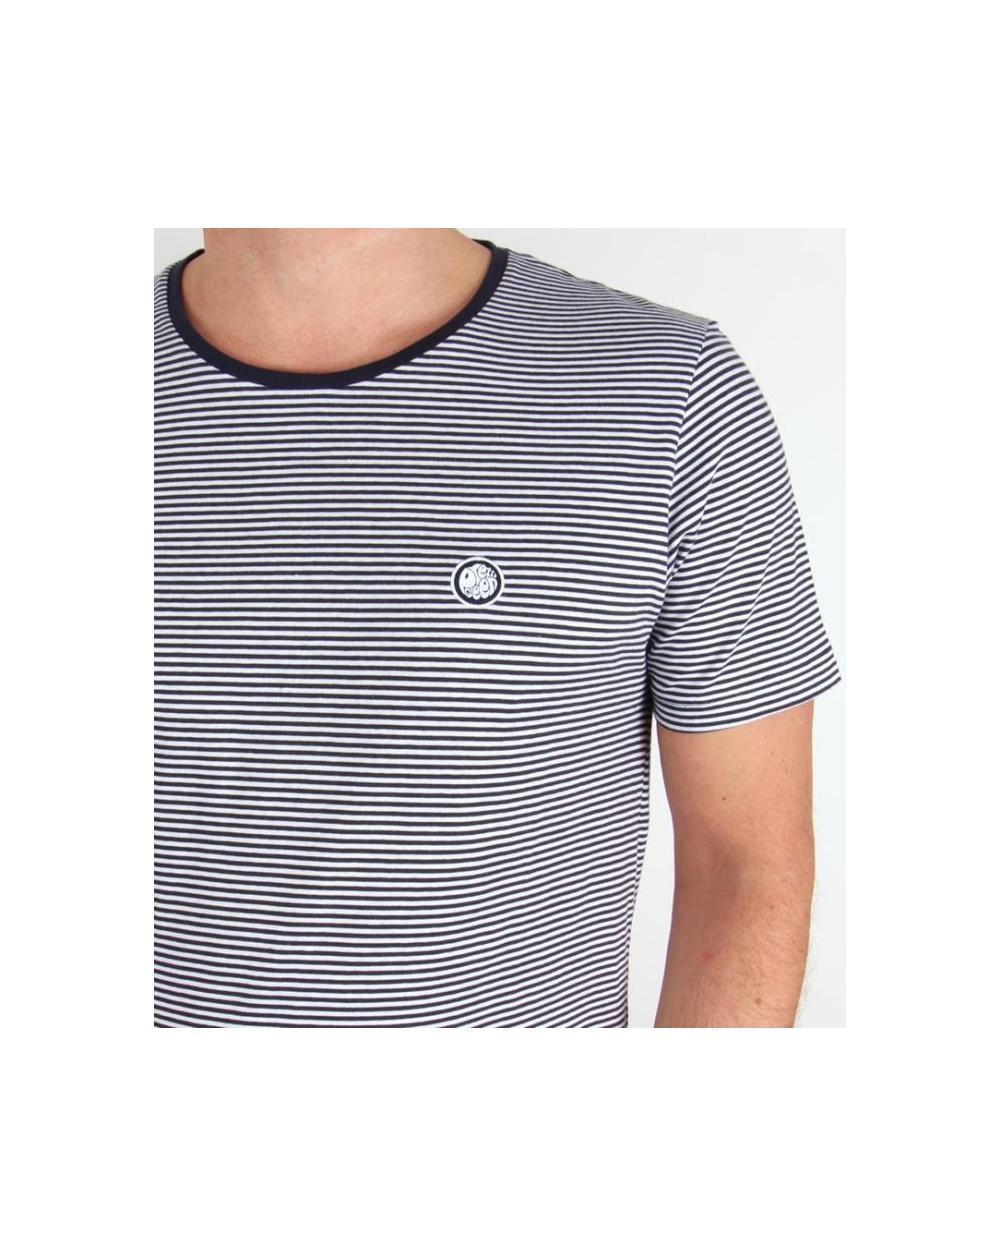 80cc15c375b43 Pretty Green Striped Feeder T-shirt Navy white